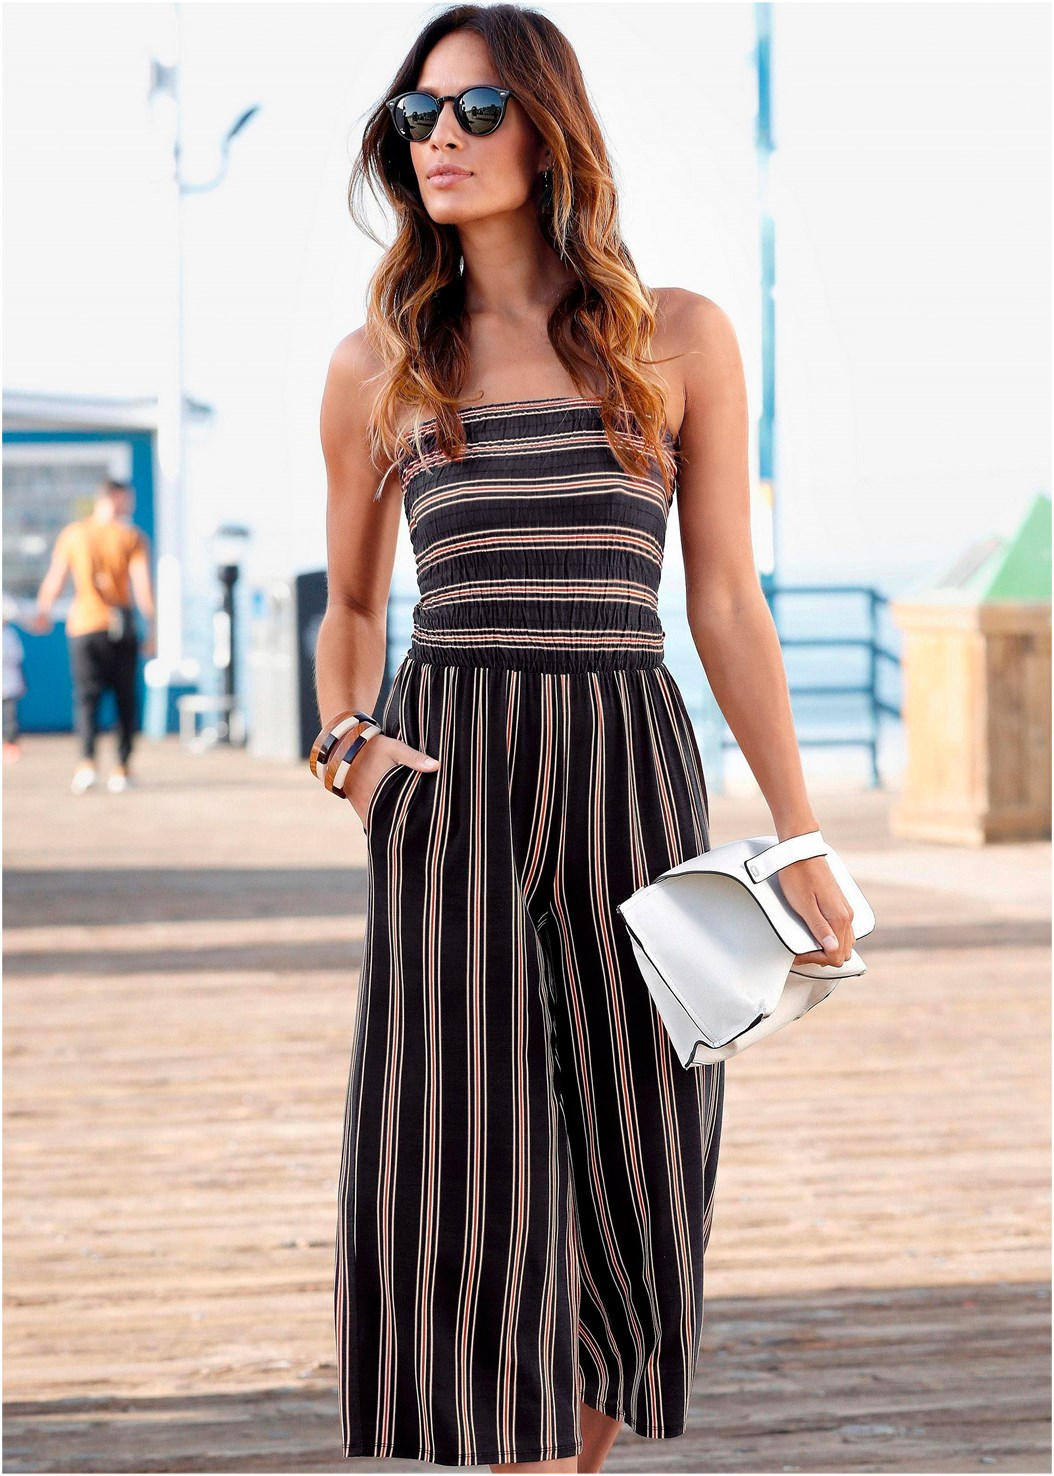 Strapless Stripe Jumpsuit,Everyday You Strapless Bra,Transparent Studded Heels